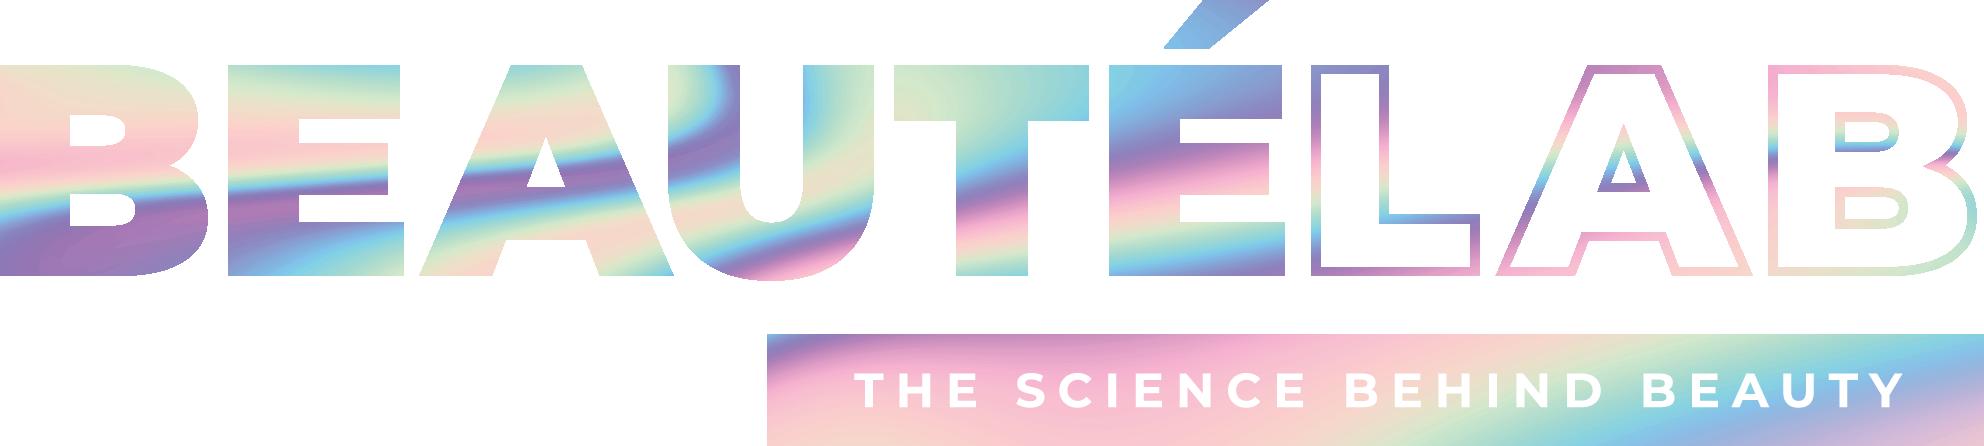 Beaute Lab Academy - Online Training Portal